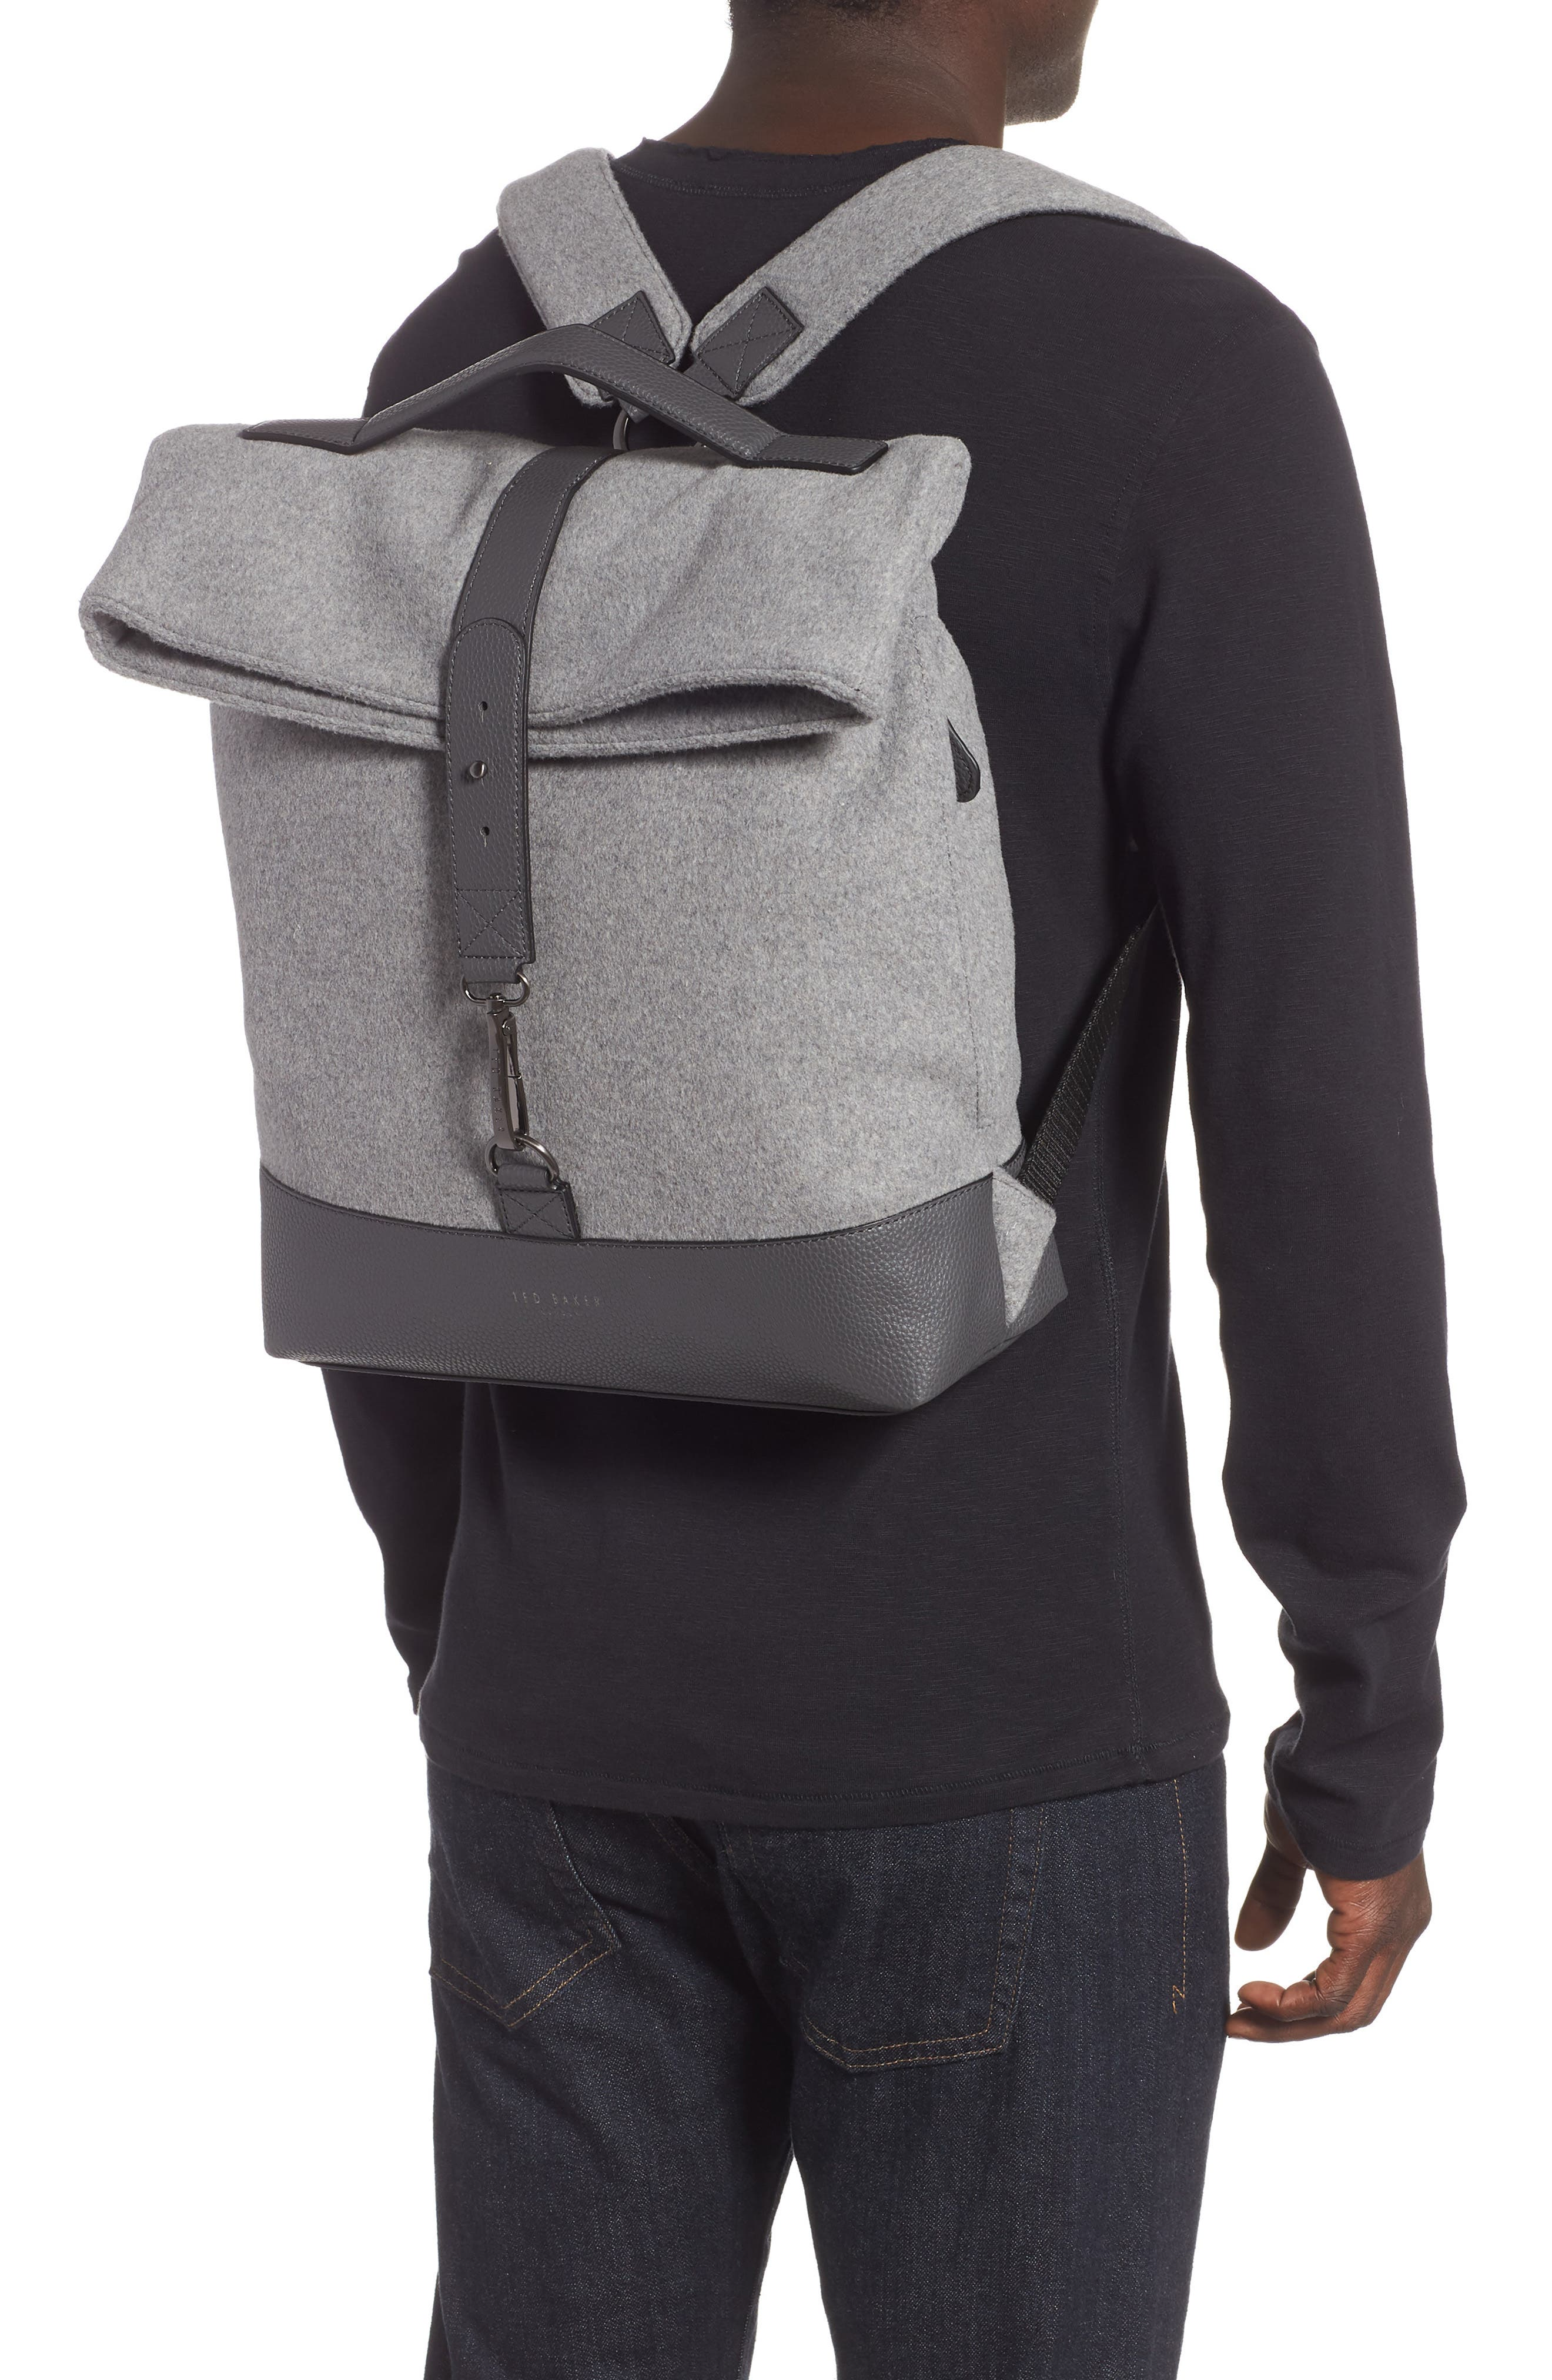 Cashed Backpack,                             Alternate thumbnail 2, color,                             GREY